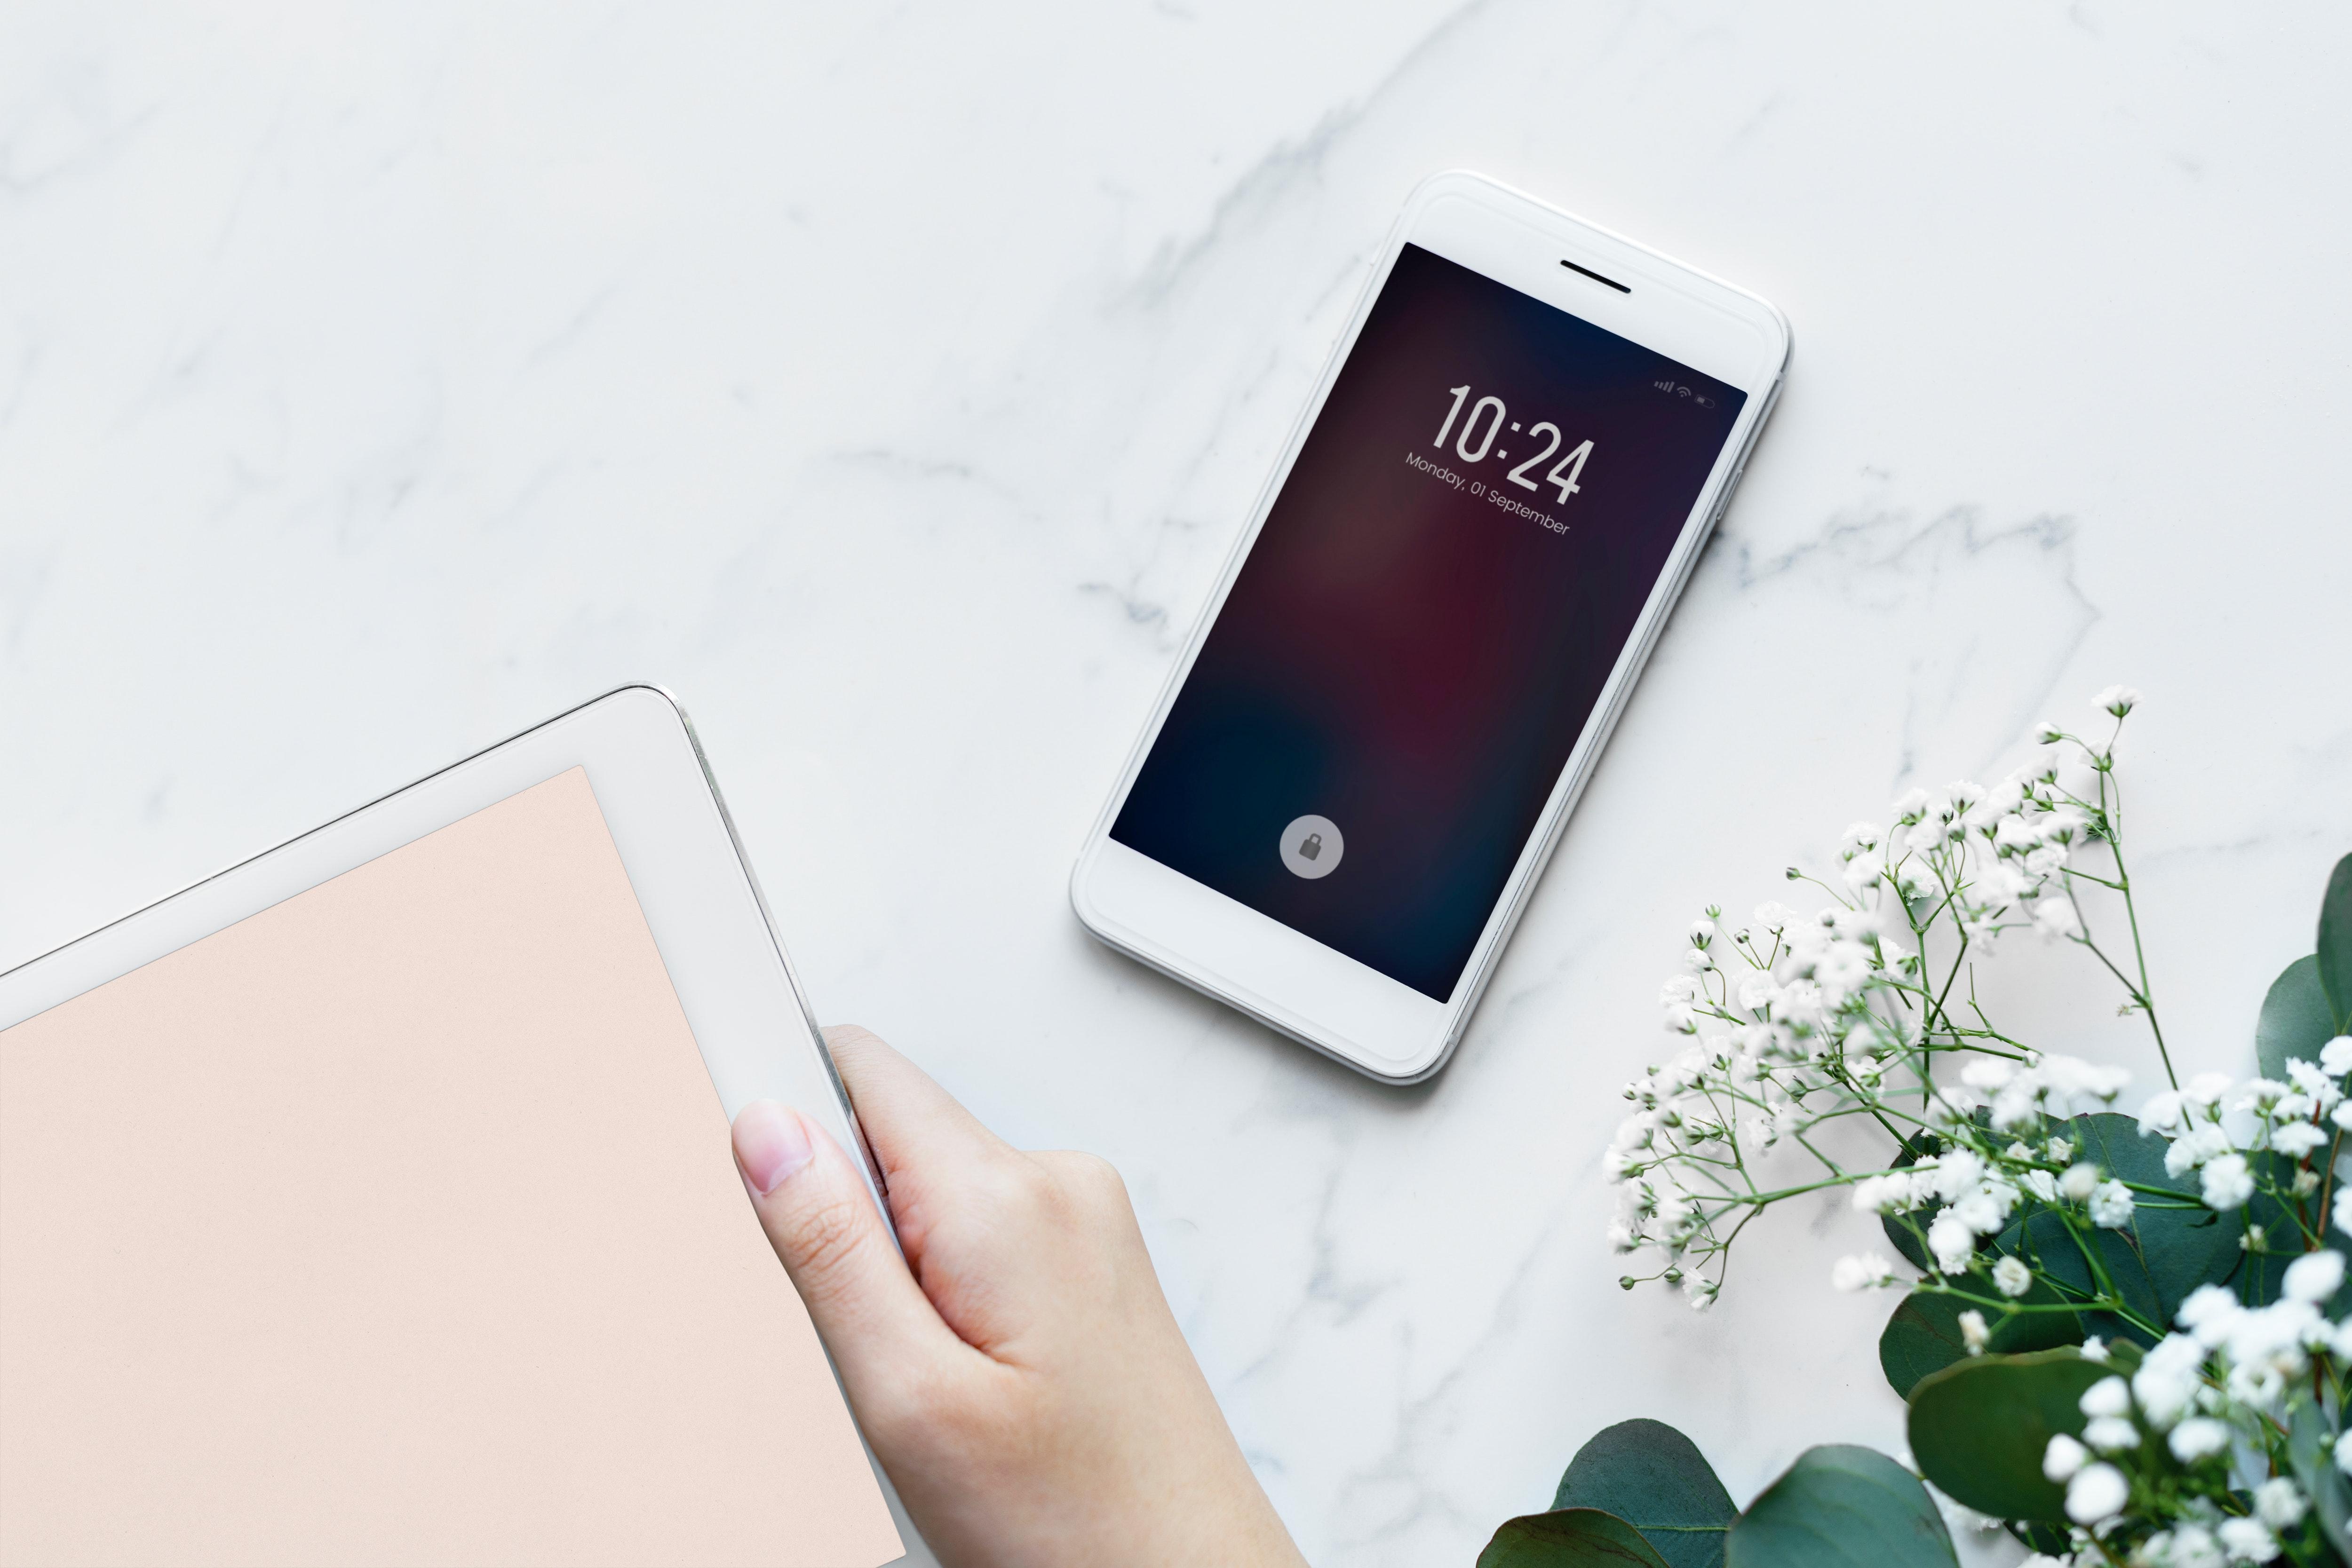 devices-electronics-flatlay-884447